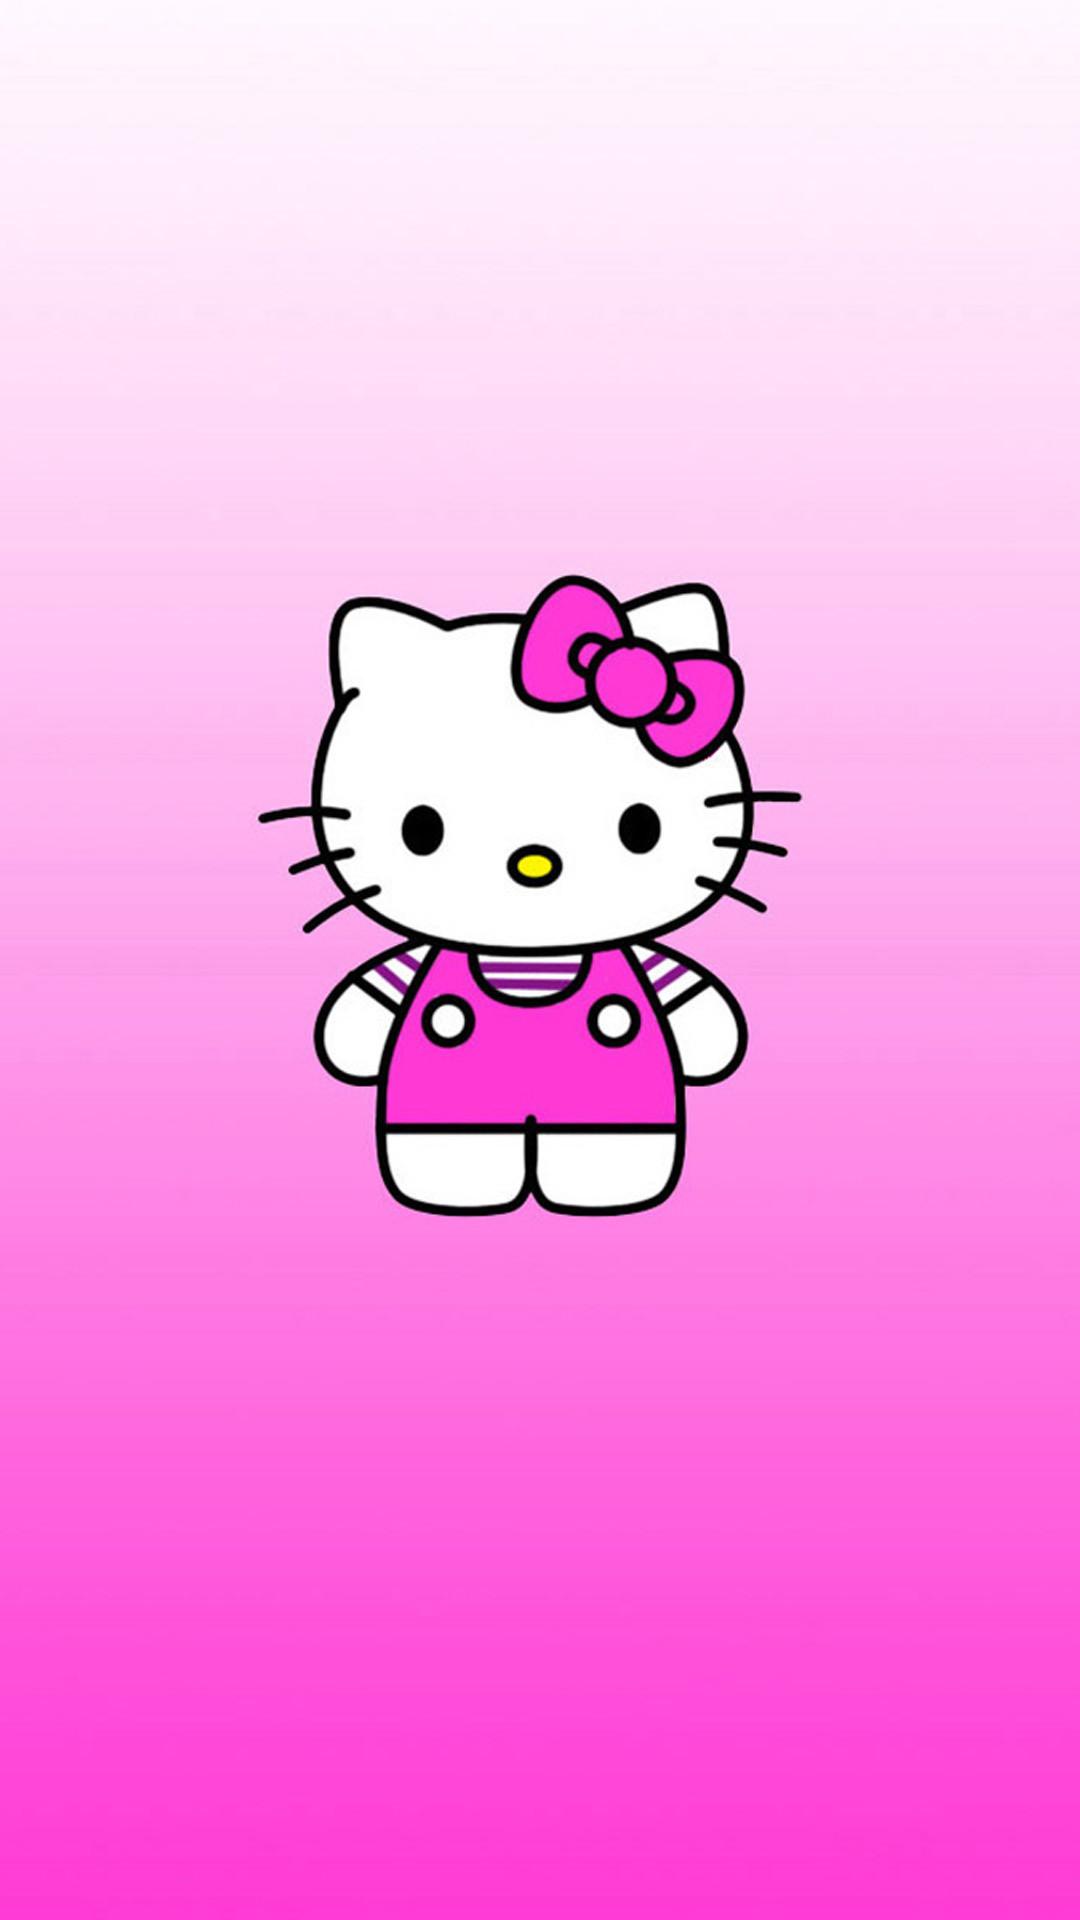 Girlish Hello Kitty Pink Cute Japan Cat